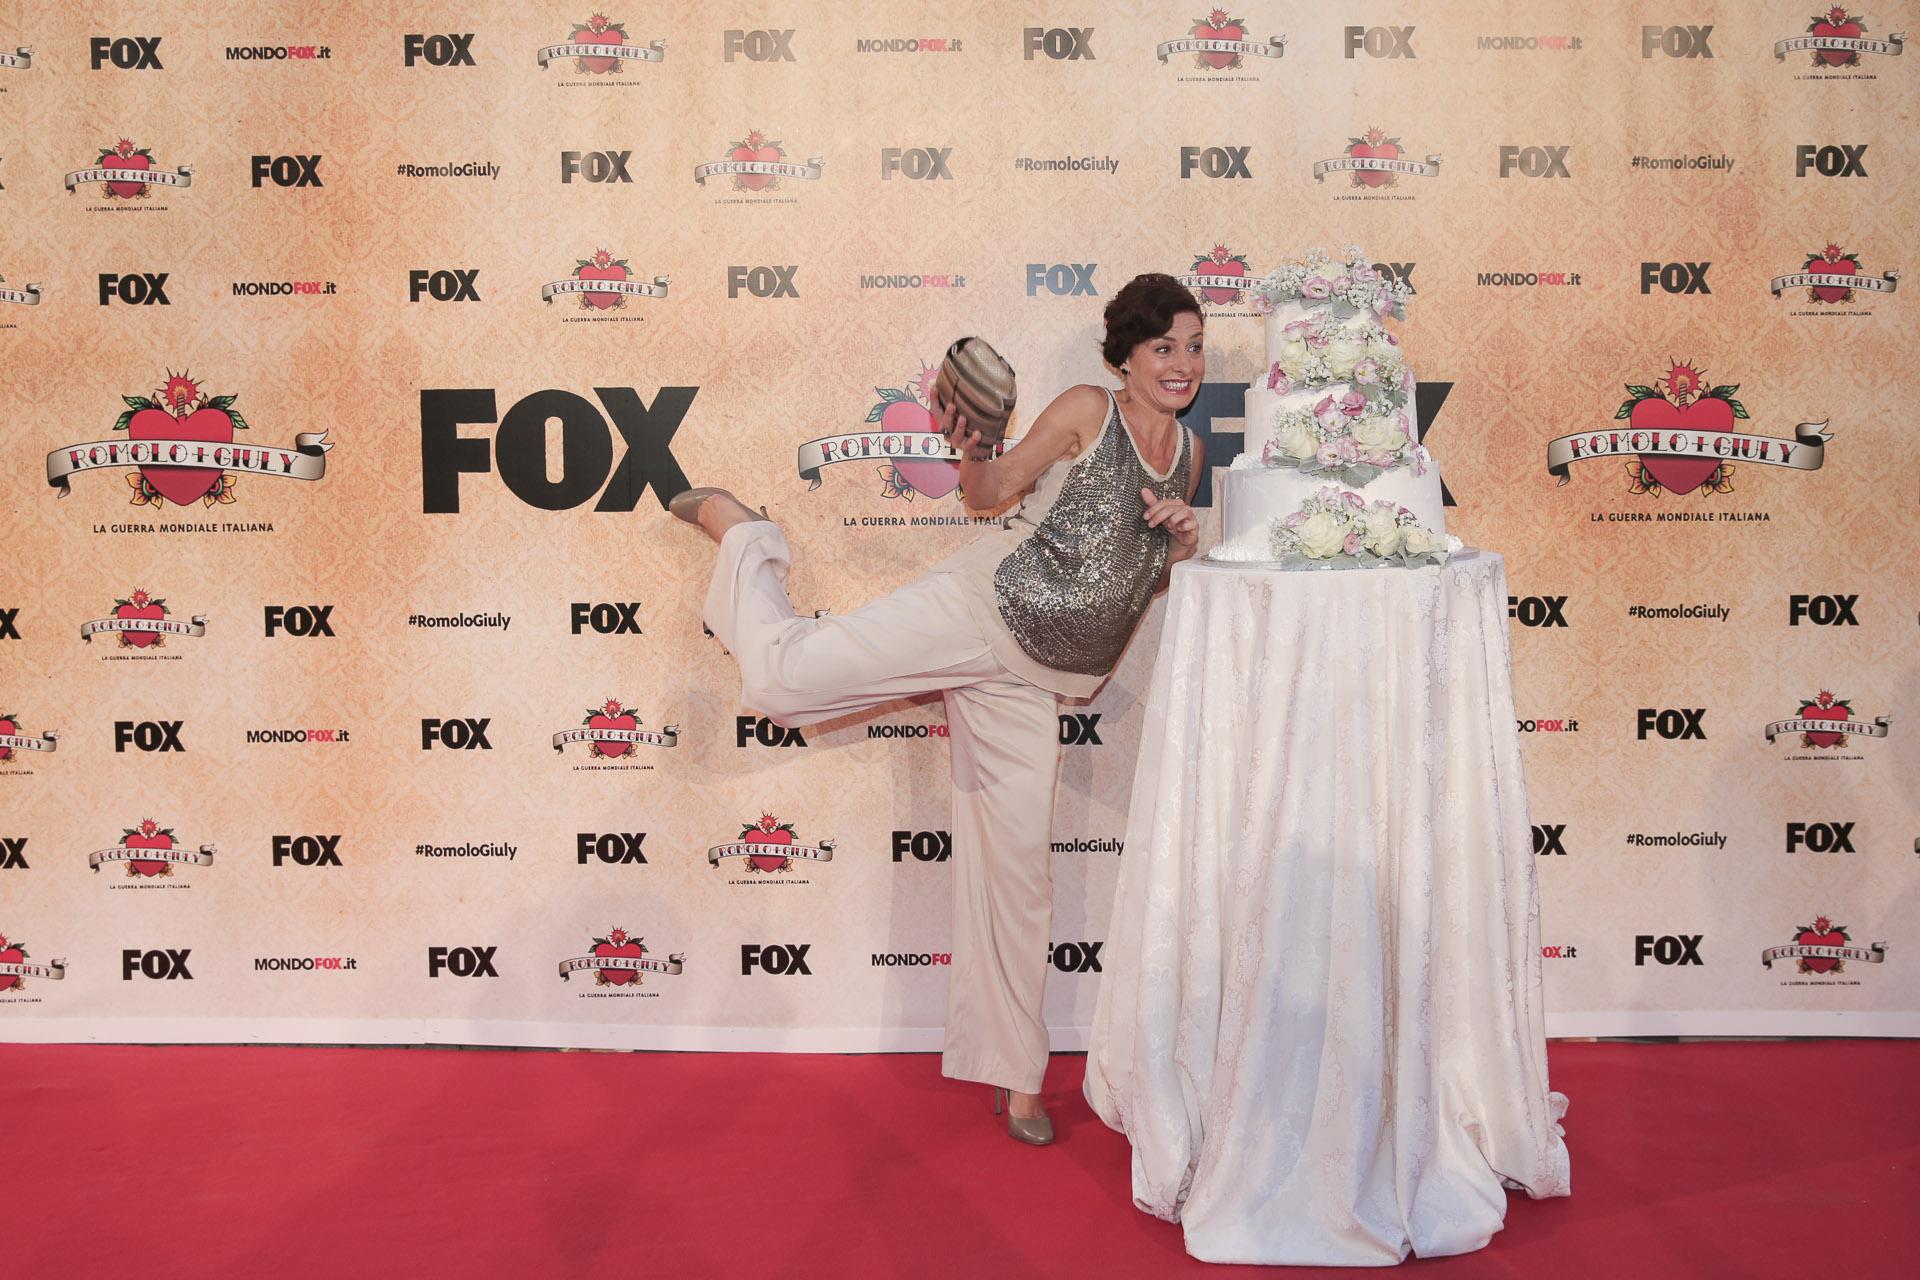 Romolo + Giuly la guerra mondiale italiana serie Fox